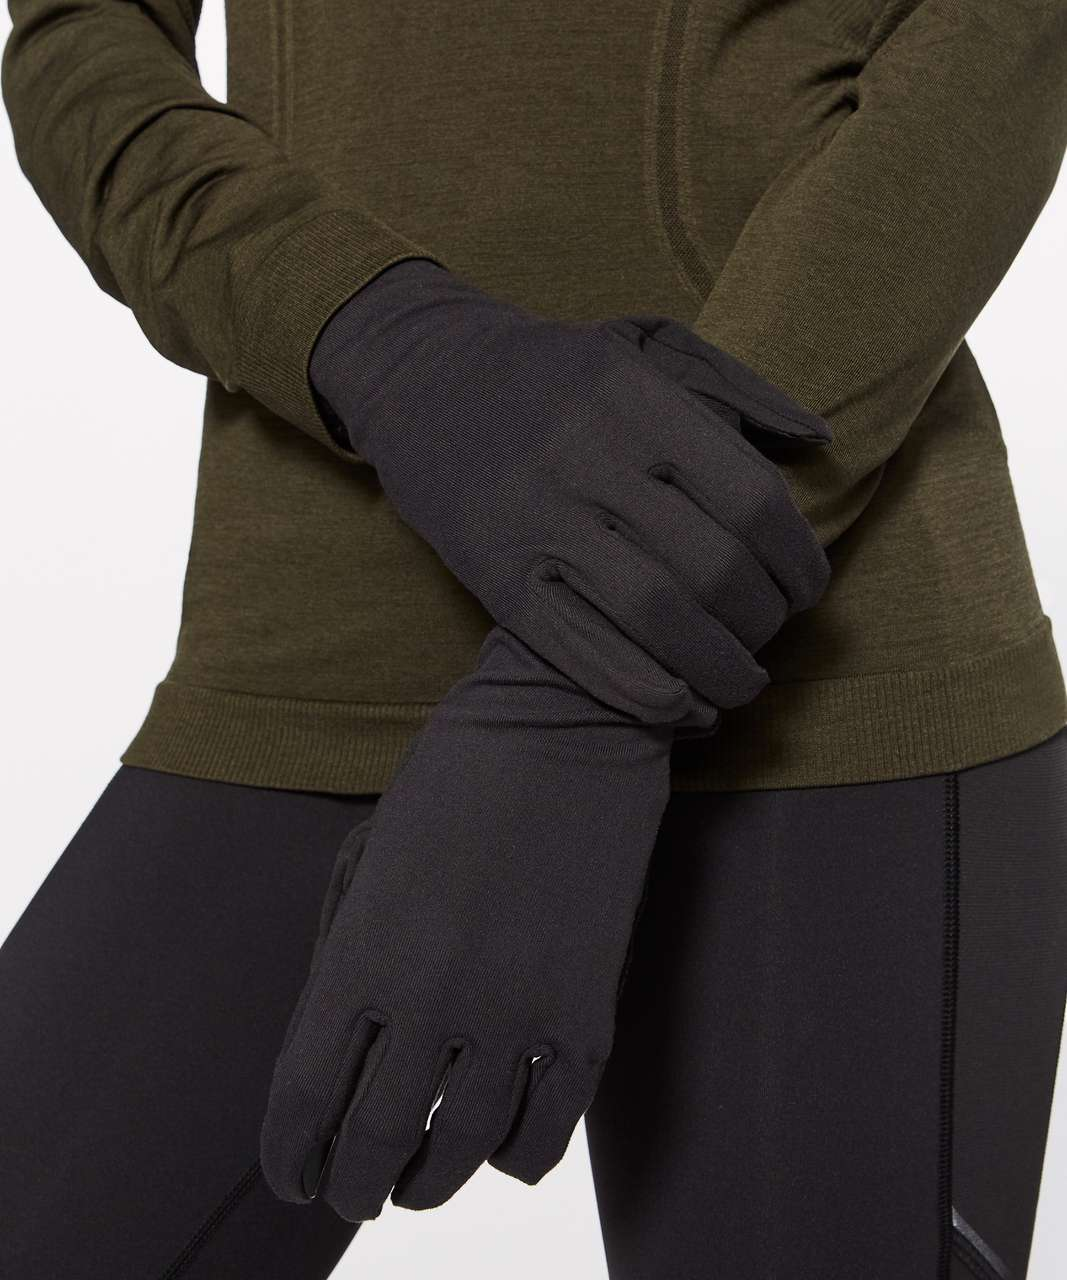 Lululemon Run It Out Kit Gloves + Toque - Black